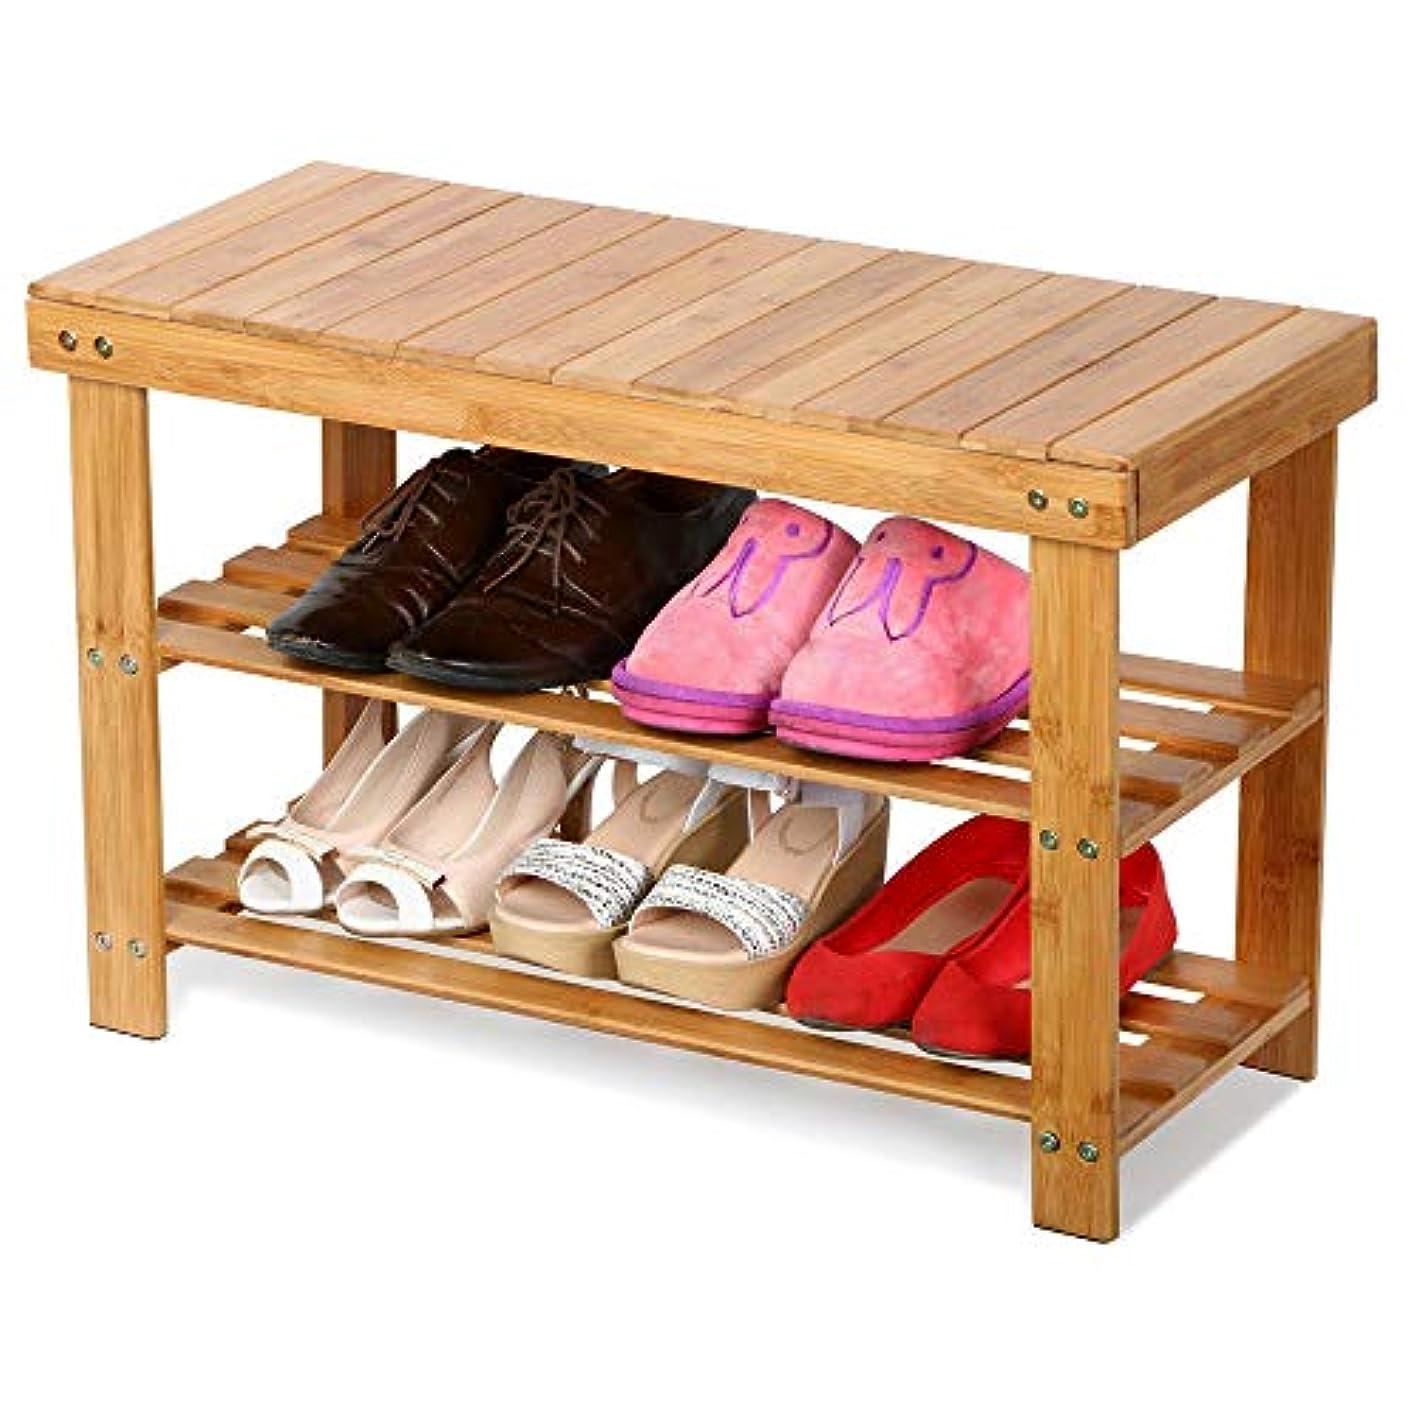 [US Stock] Bamboo Rack Room Shoe Bench Organizers Seat Storage Closet Entryway 2-Tier NEW